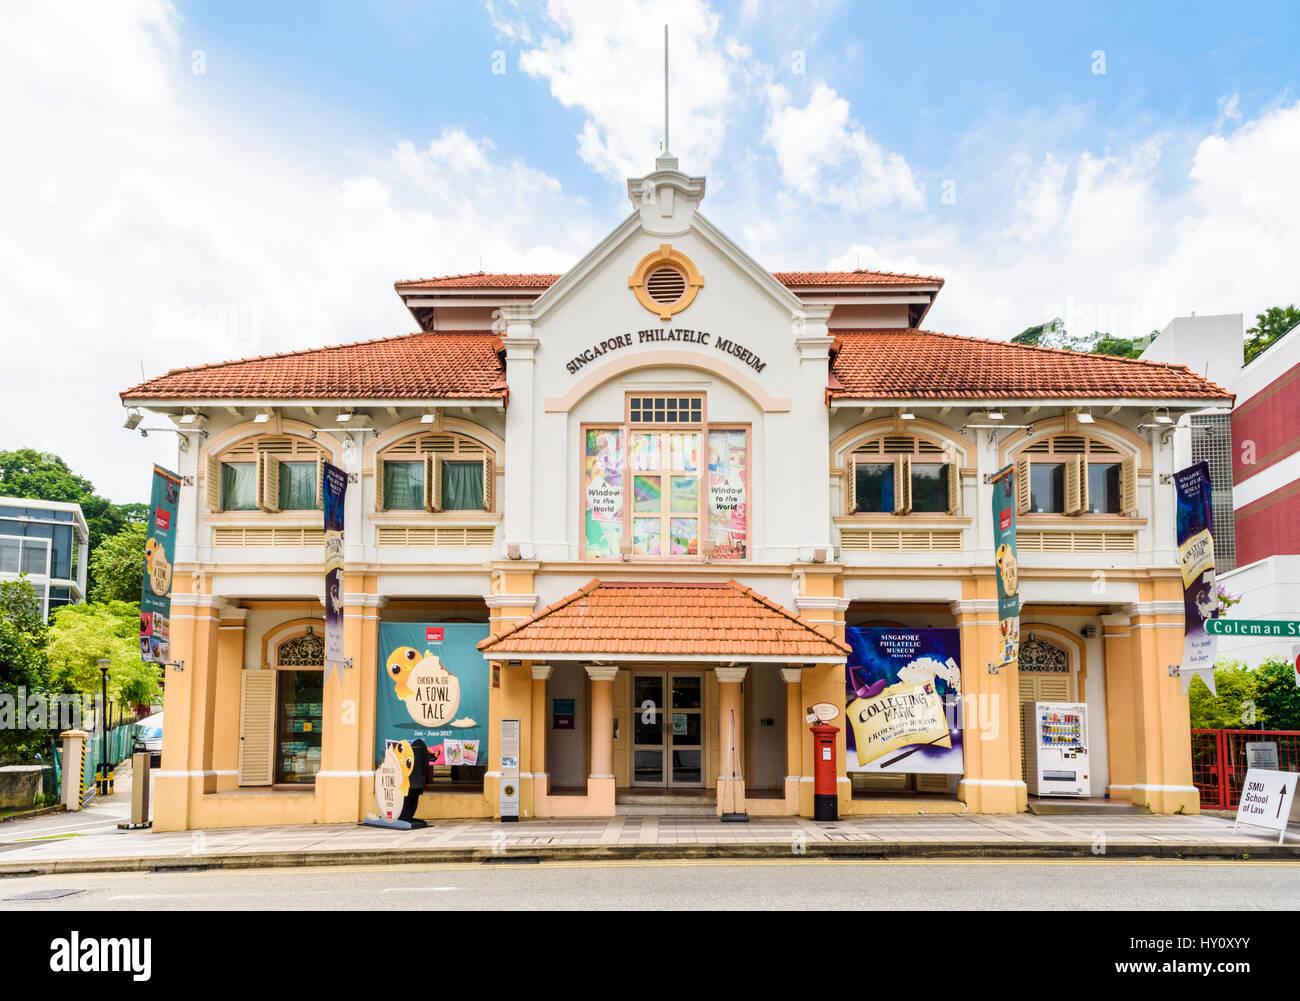 Singapore Philatelic Museum in Singapore - Stock Image